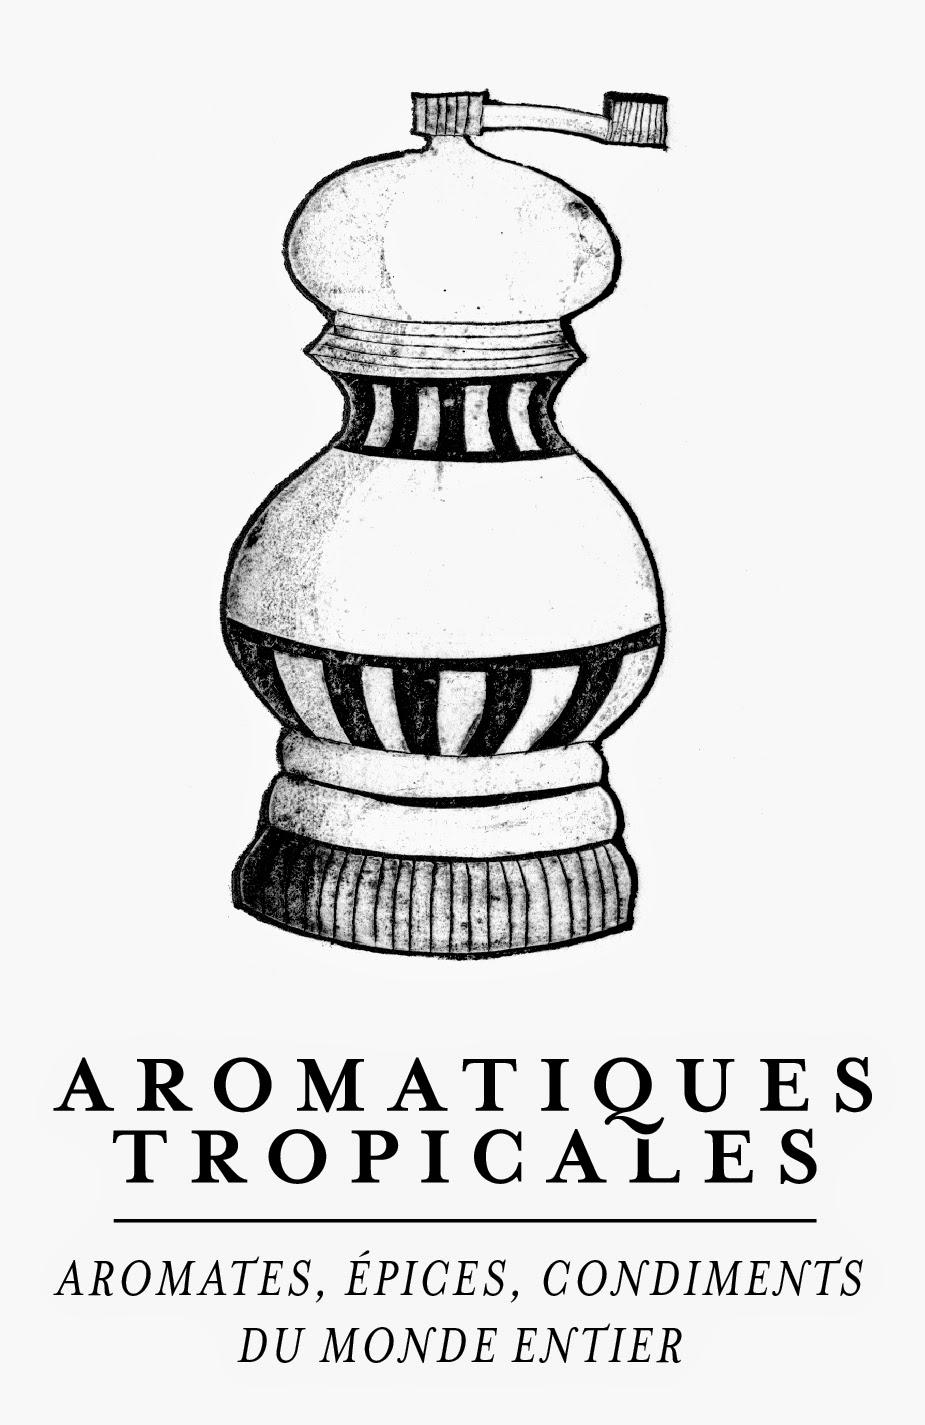 http://www.aromatiques.com